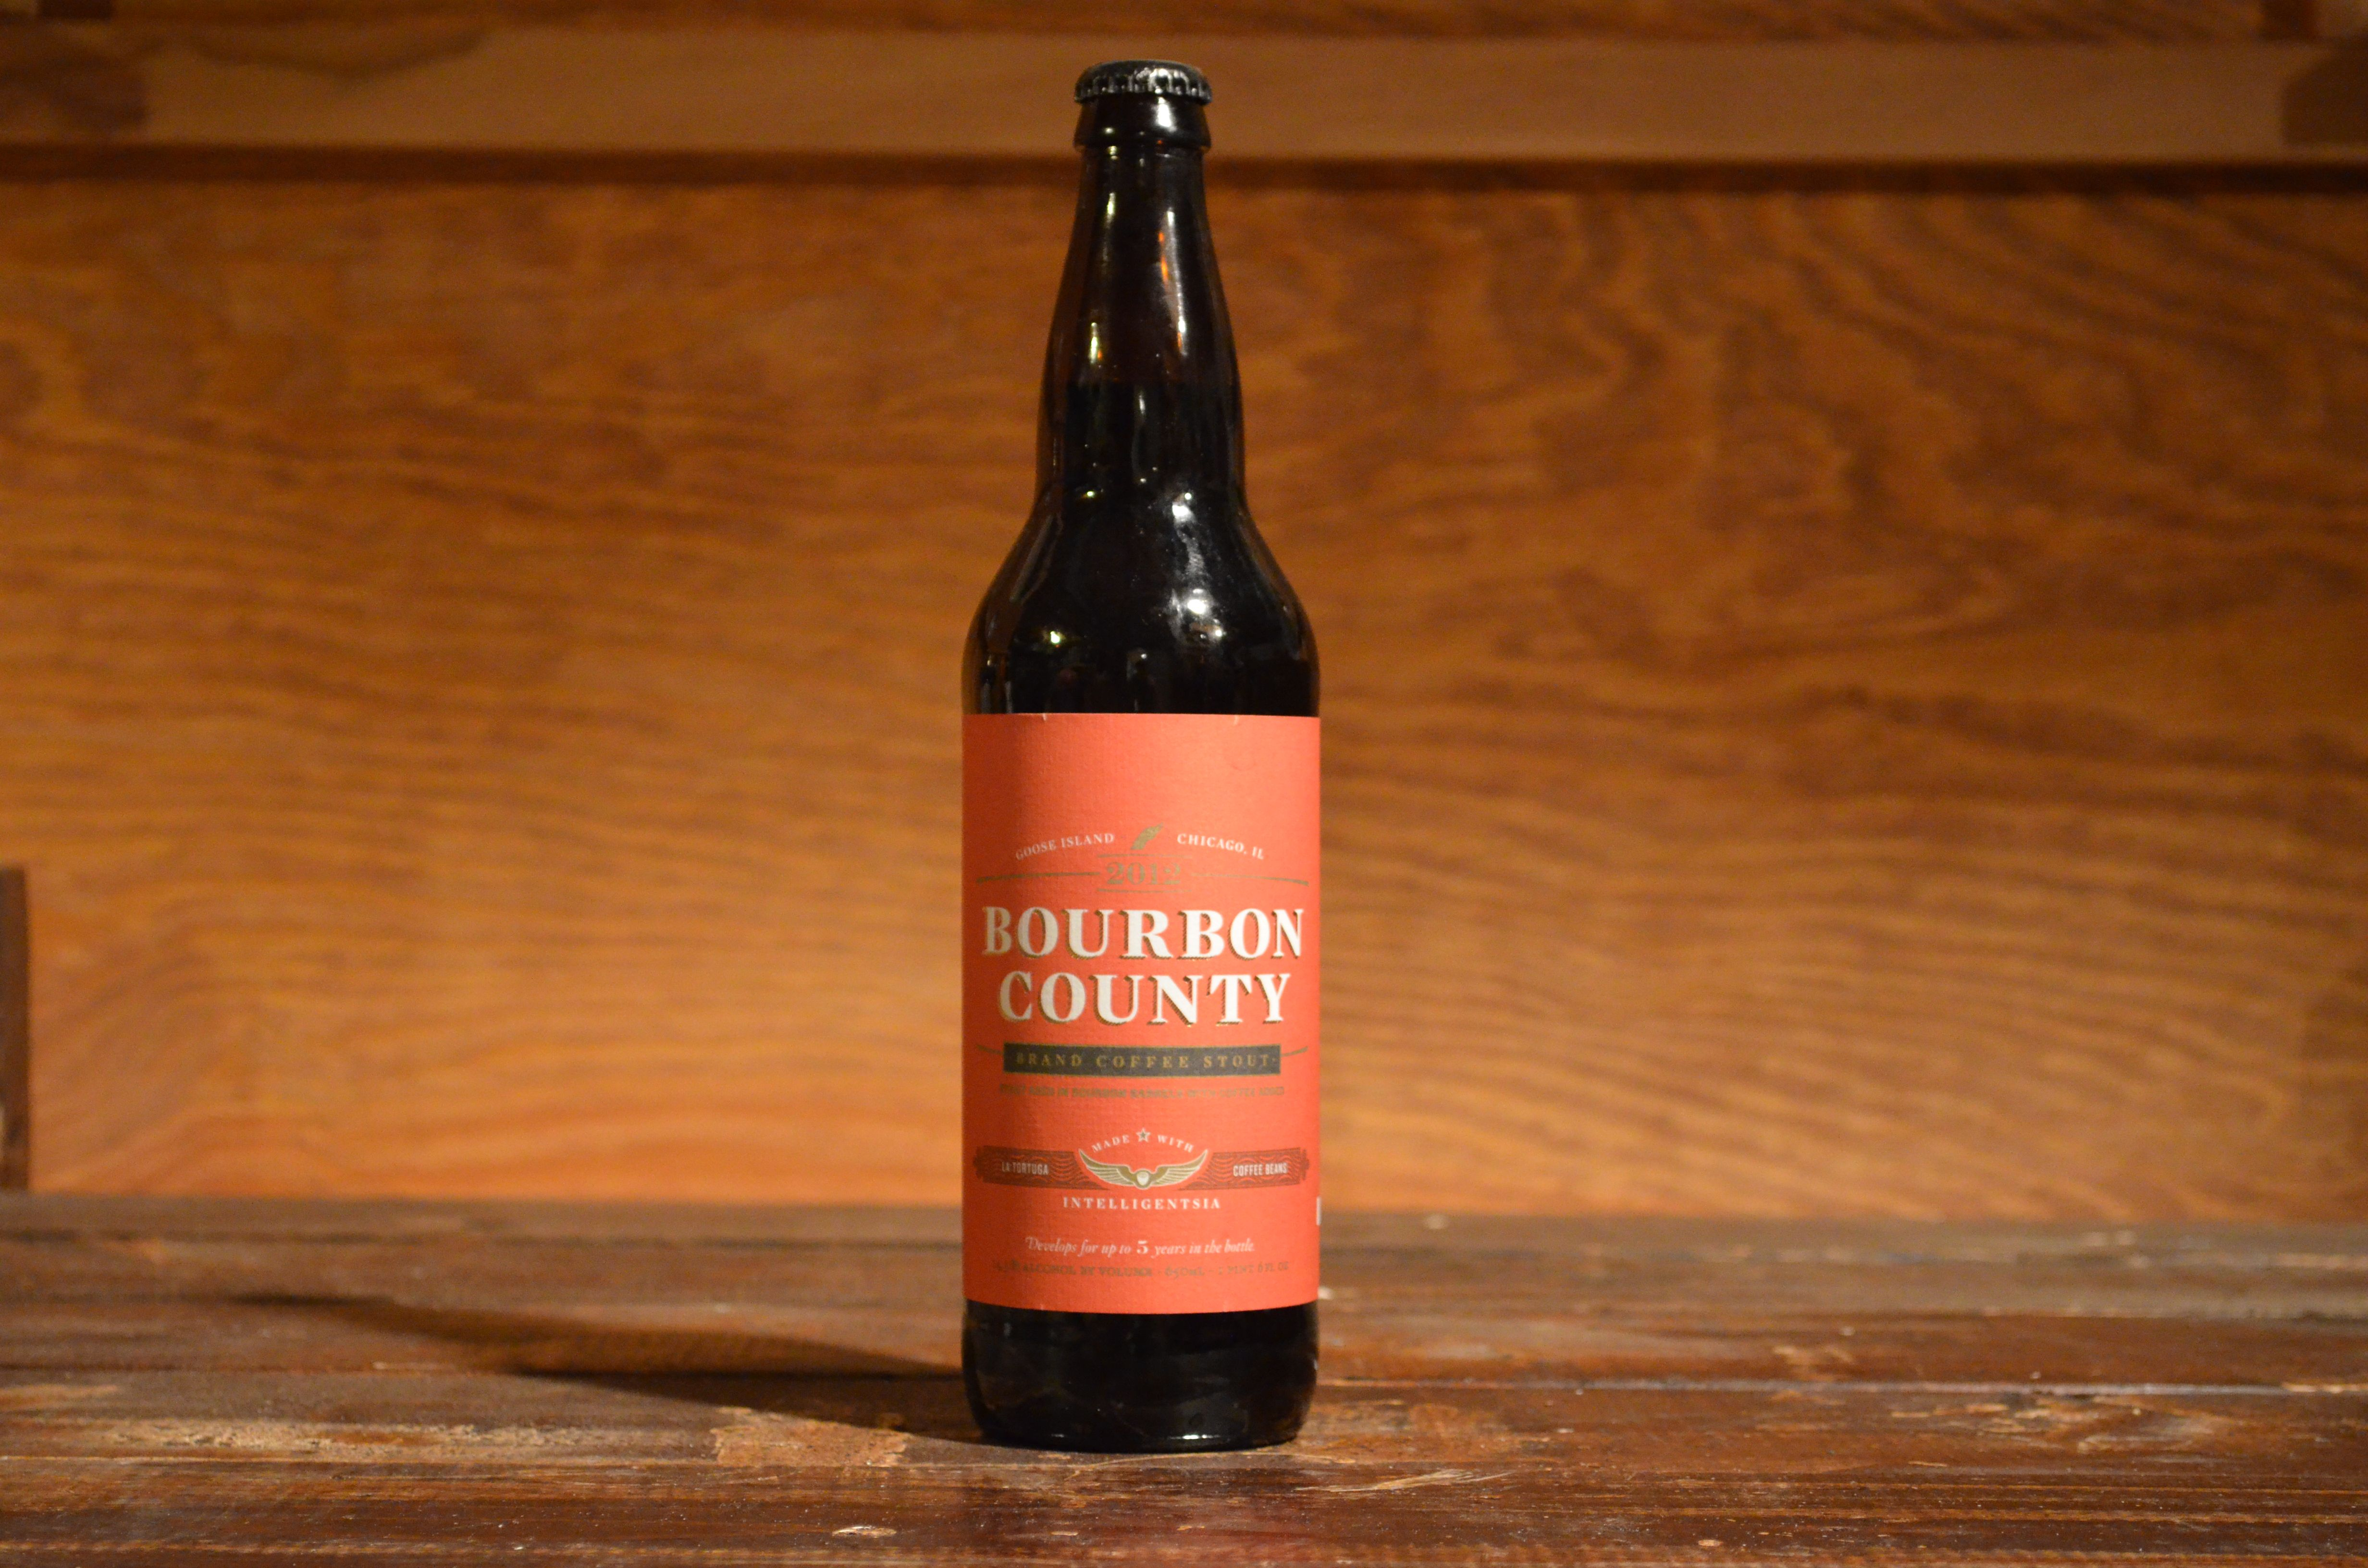 Goose Island - Bourbon County Brand Coffee Stout. 2 bottles.